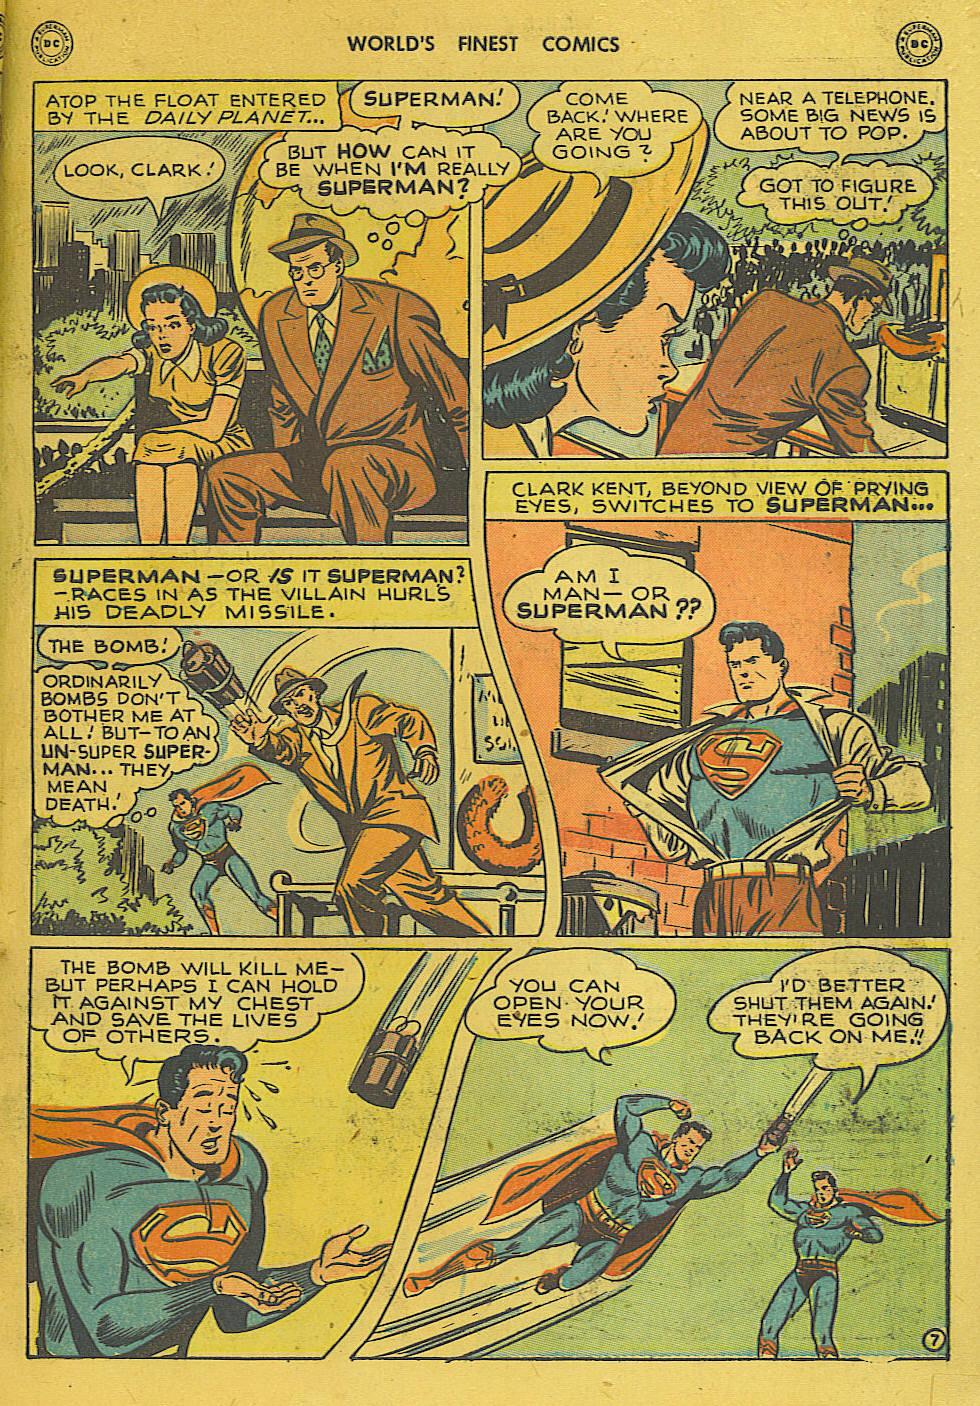 Read online World's Finest Comics comic -  Issue #34 - 9